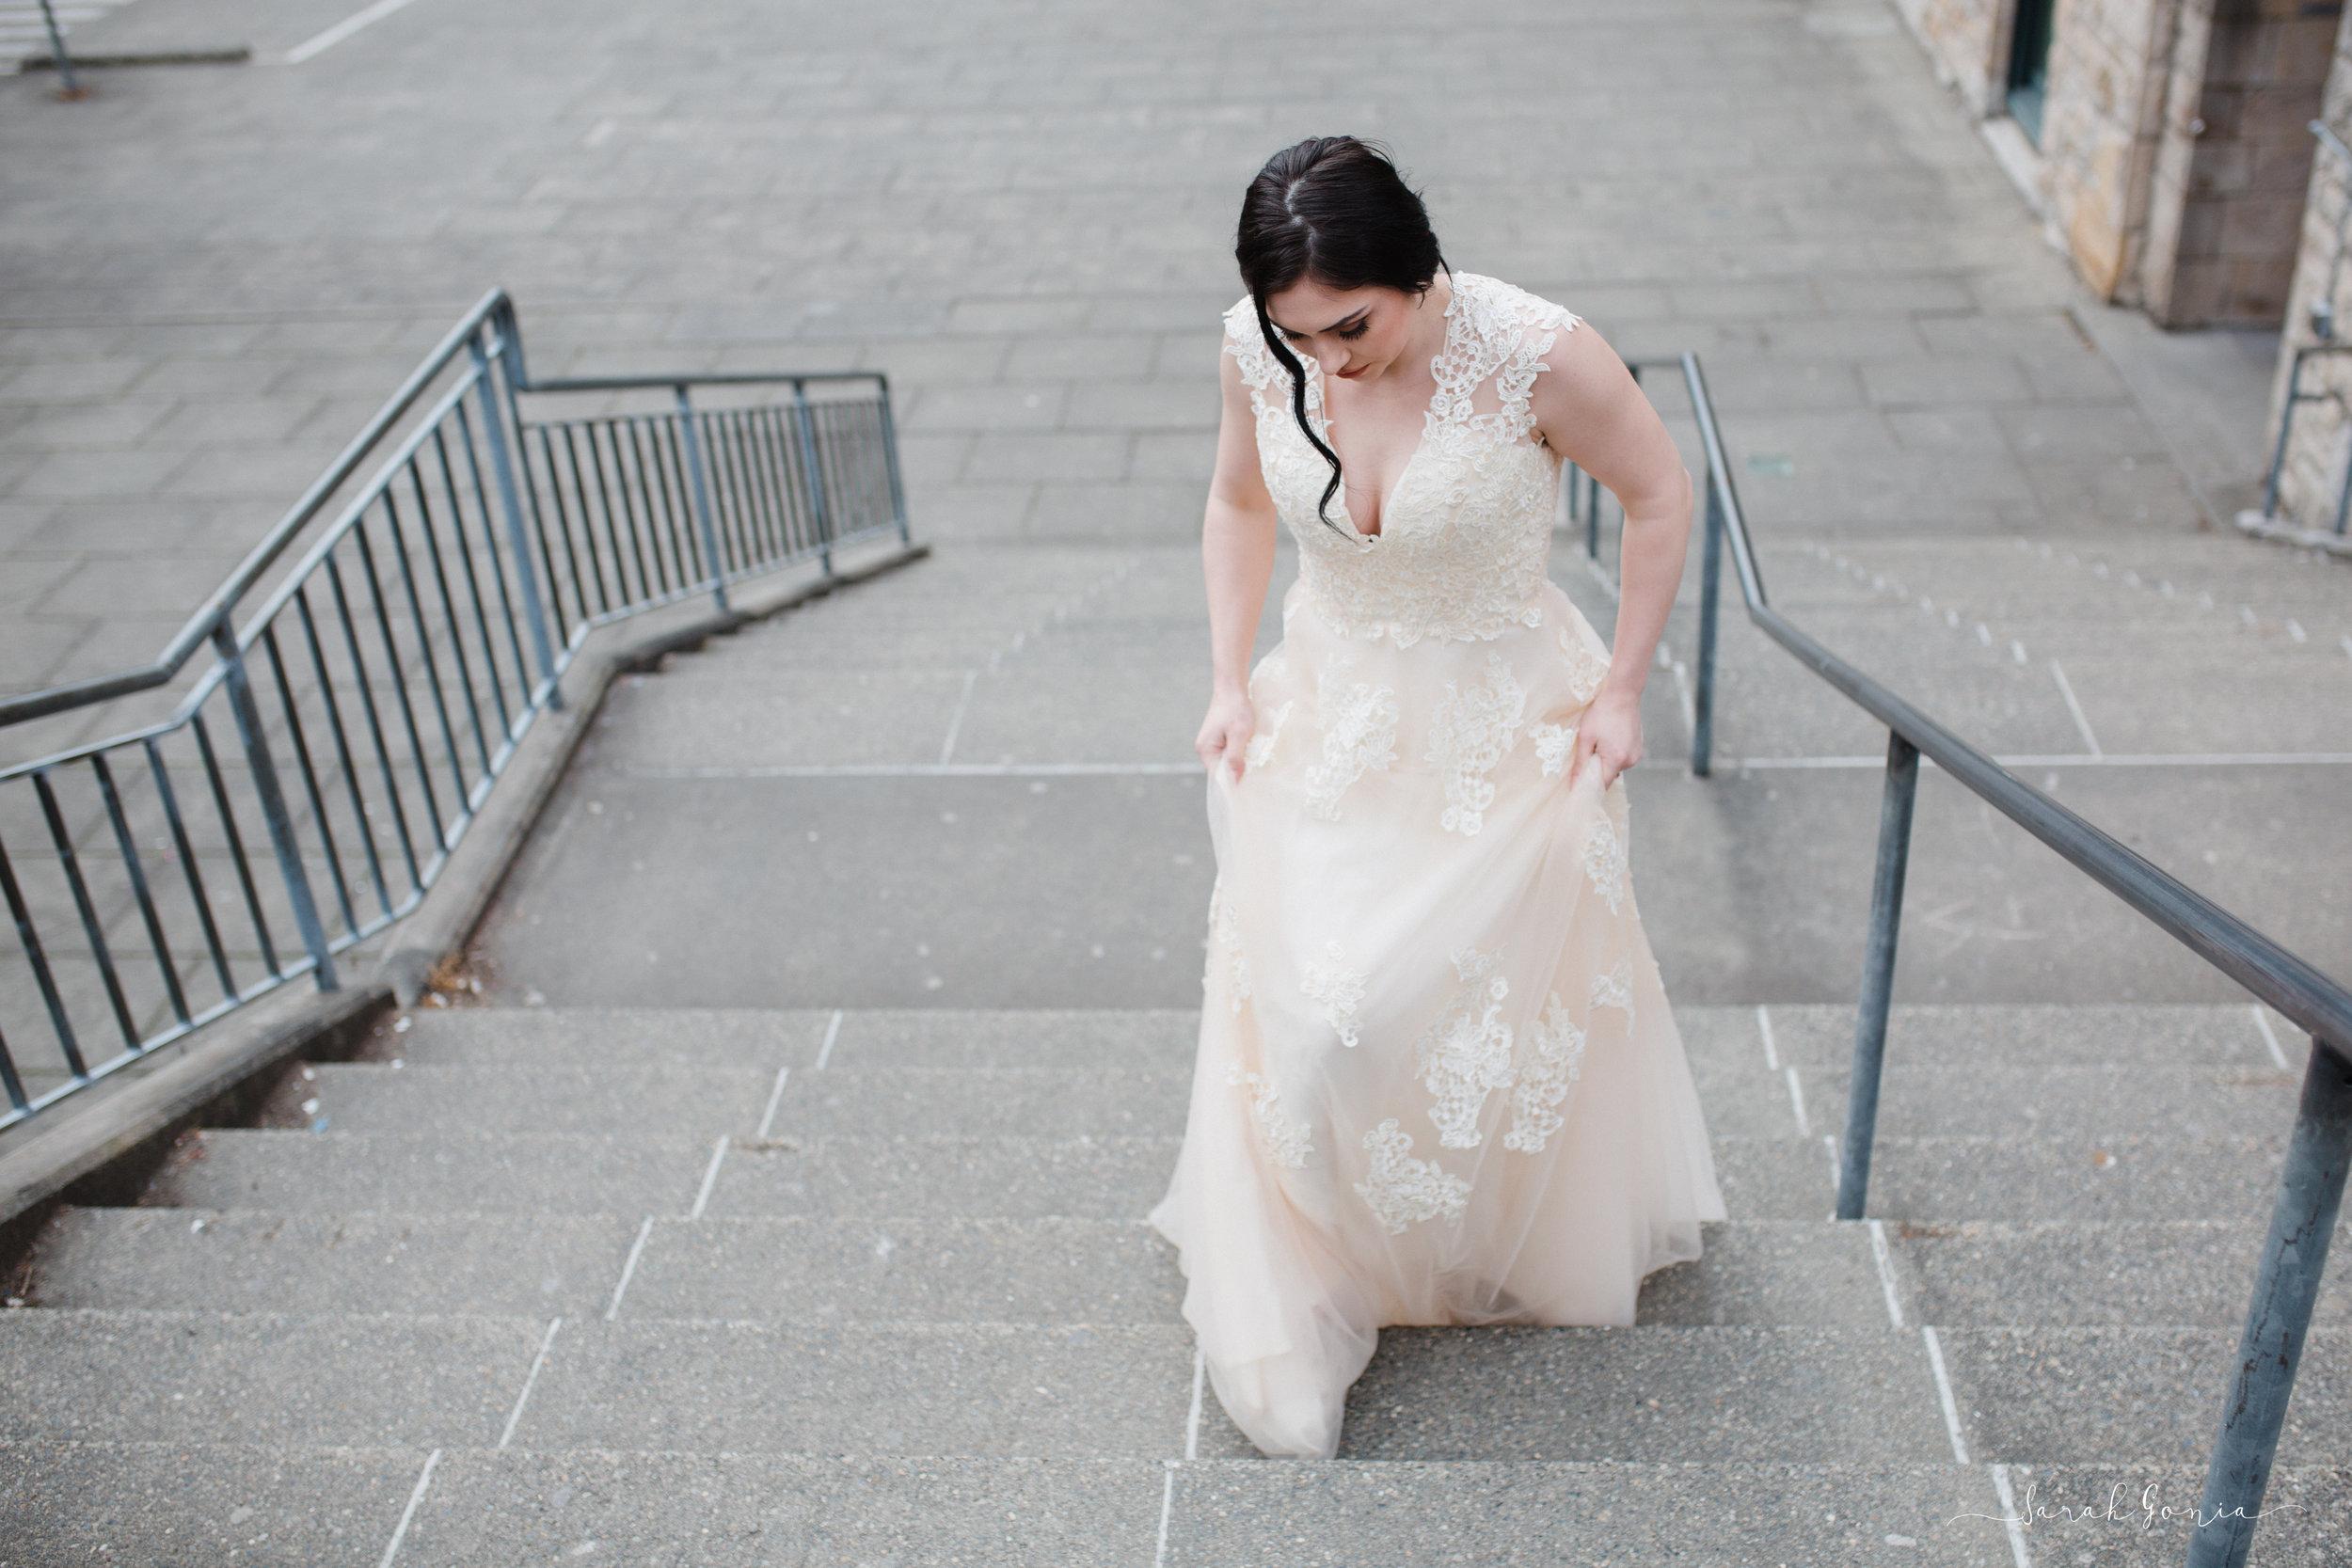 Leia Bridal - Sarah Gonia Photography (36 of 108).JPG